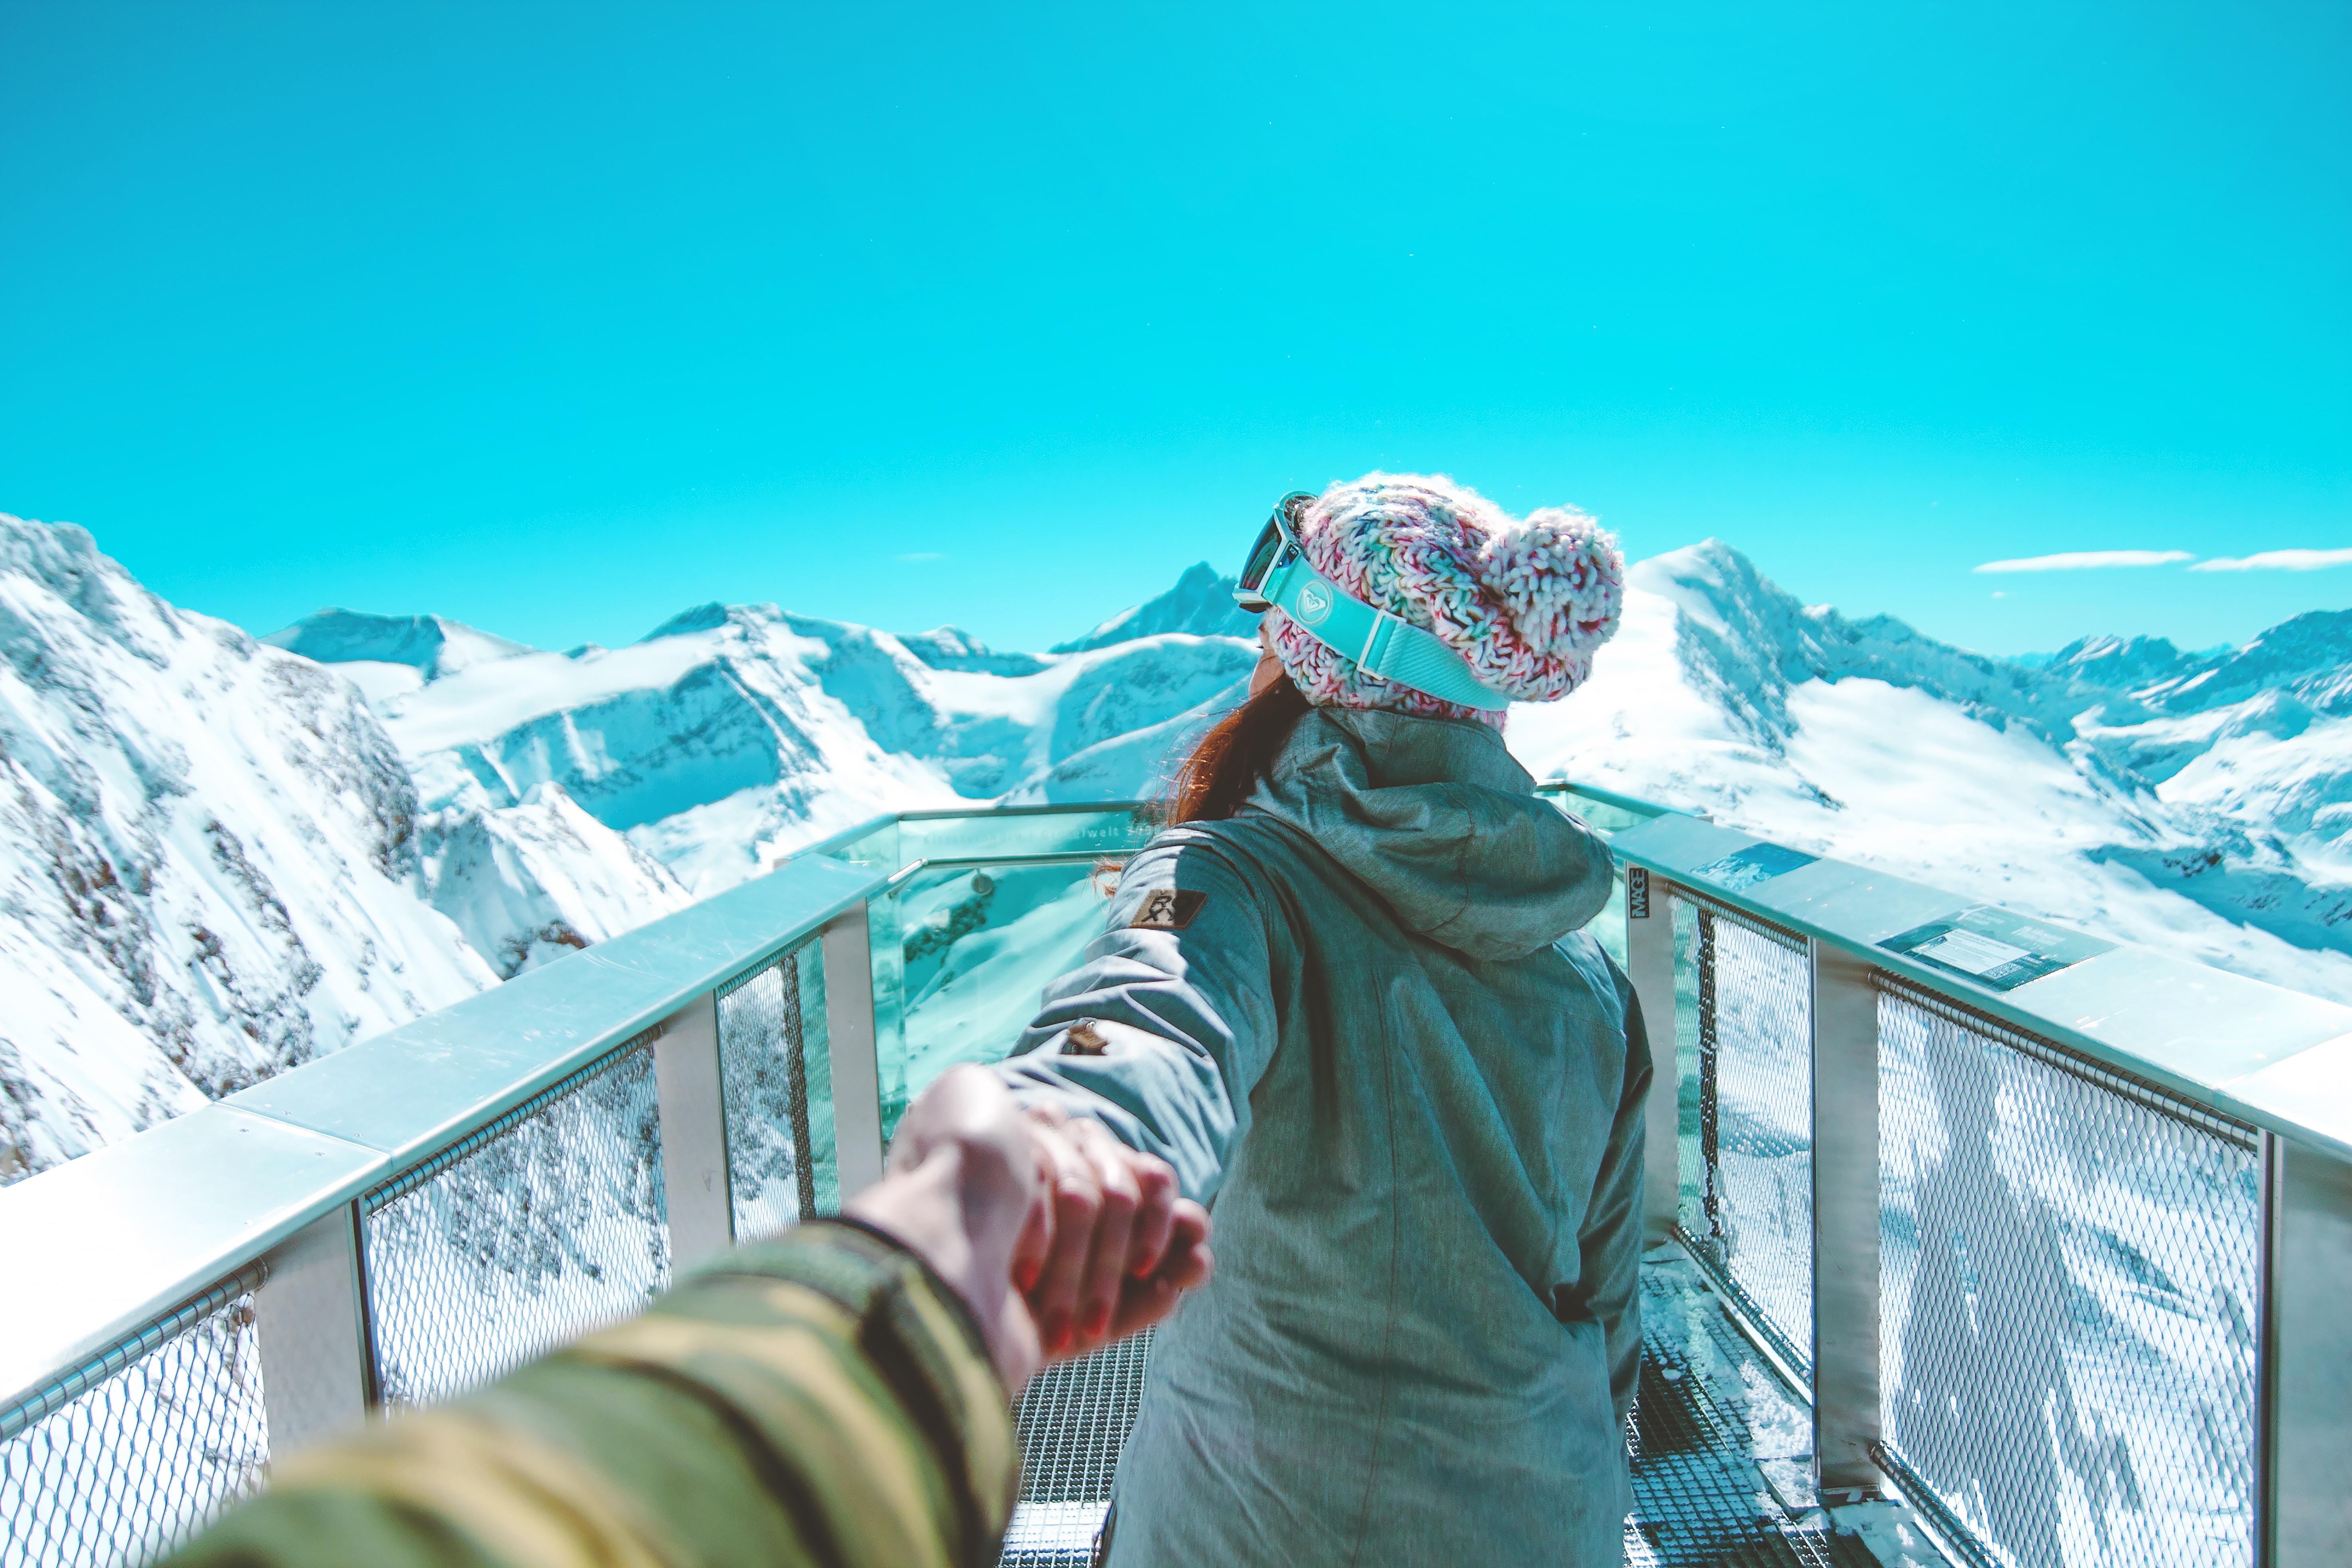 woman facing backwards near mountains